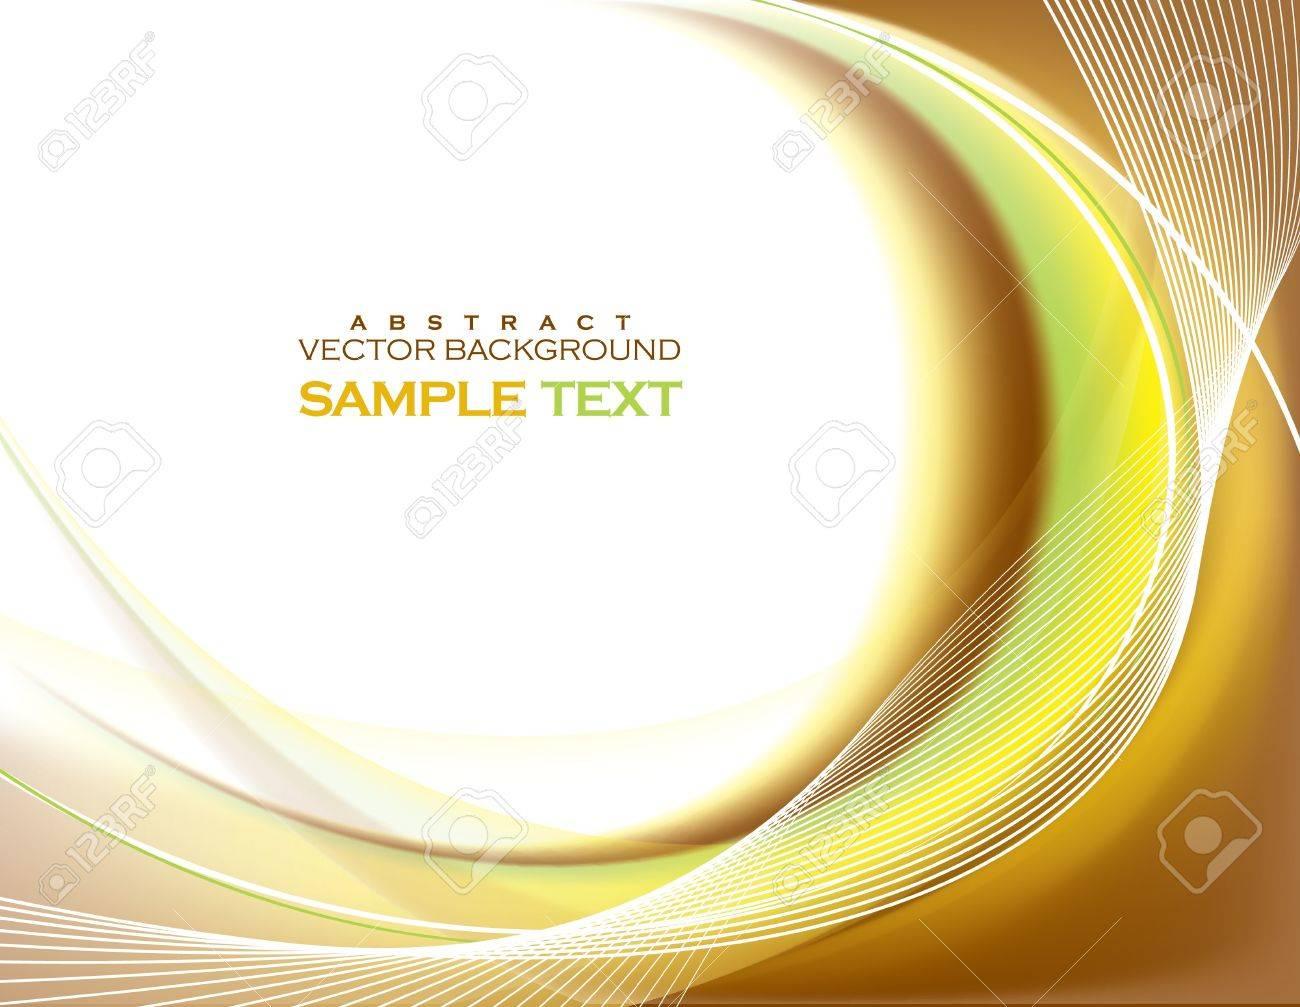 Vector Background. Eps10 Format. Stock Vector - 12799255